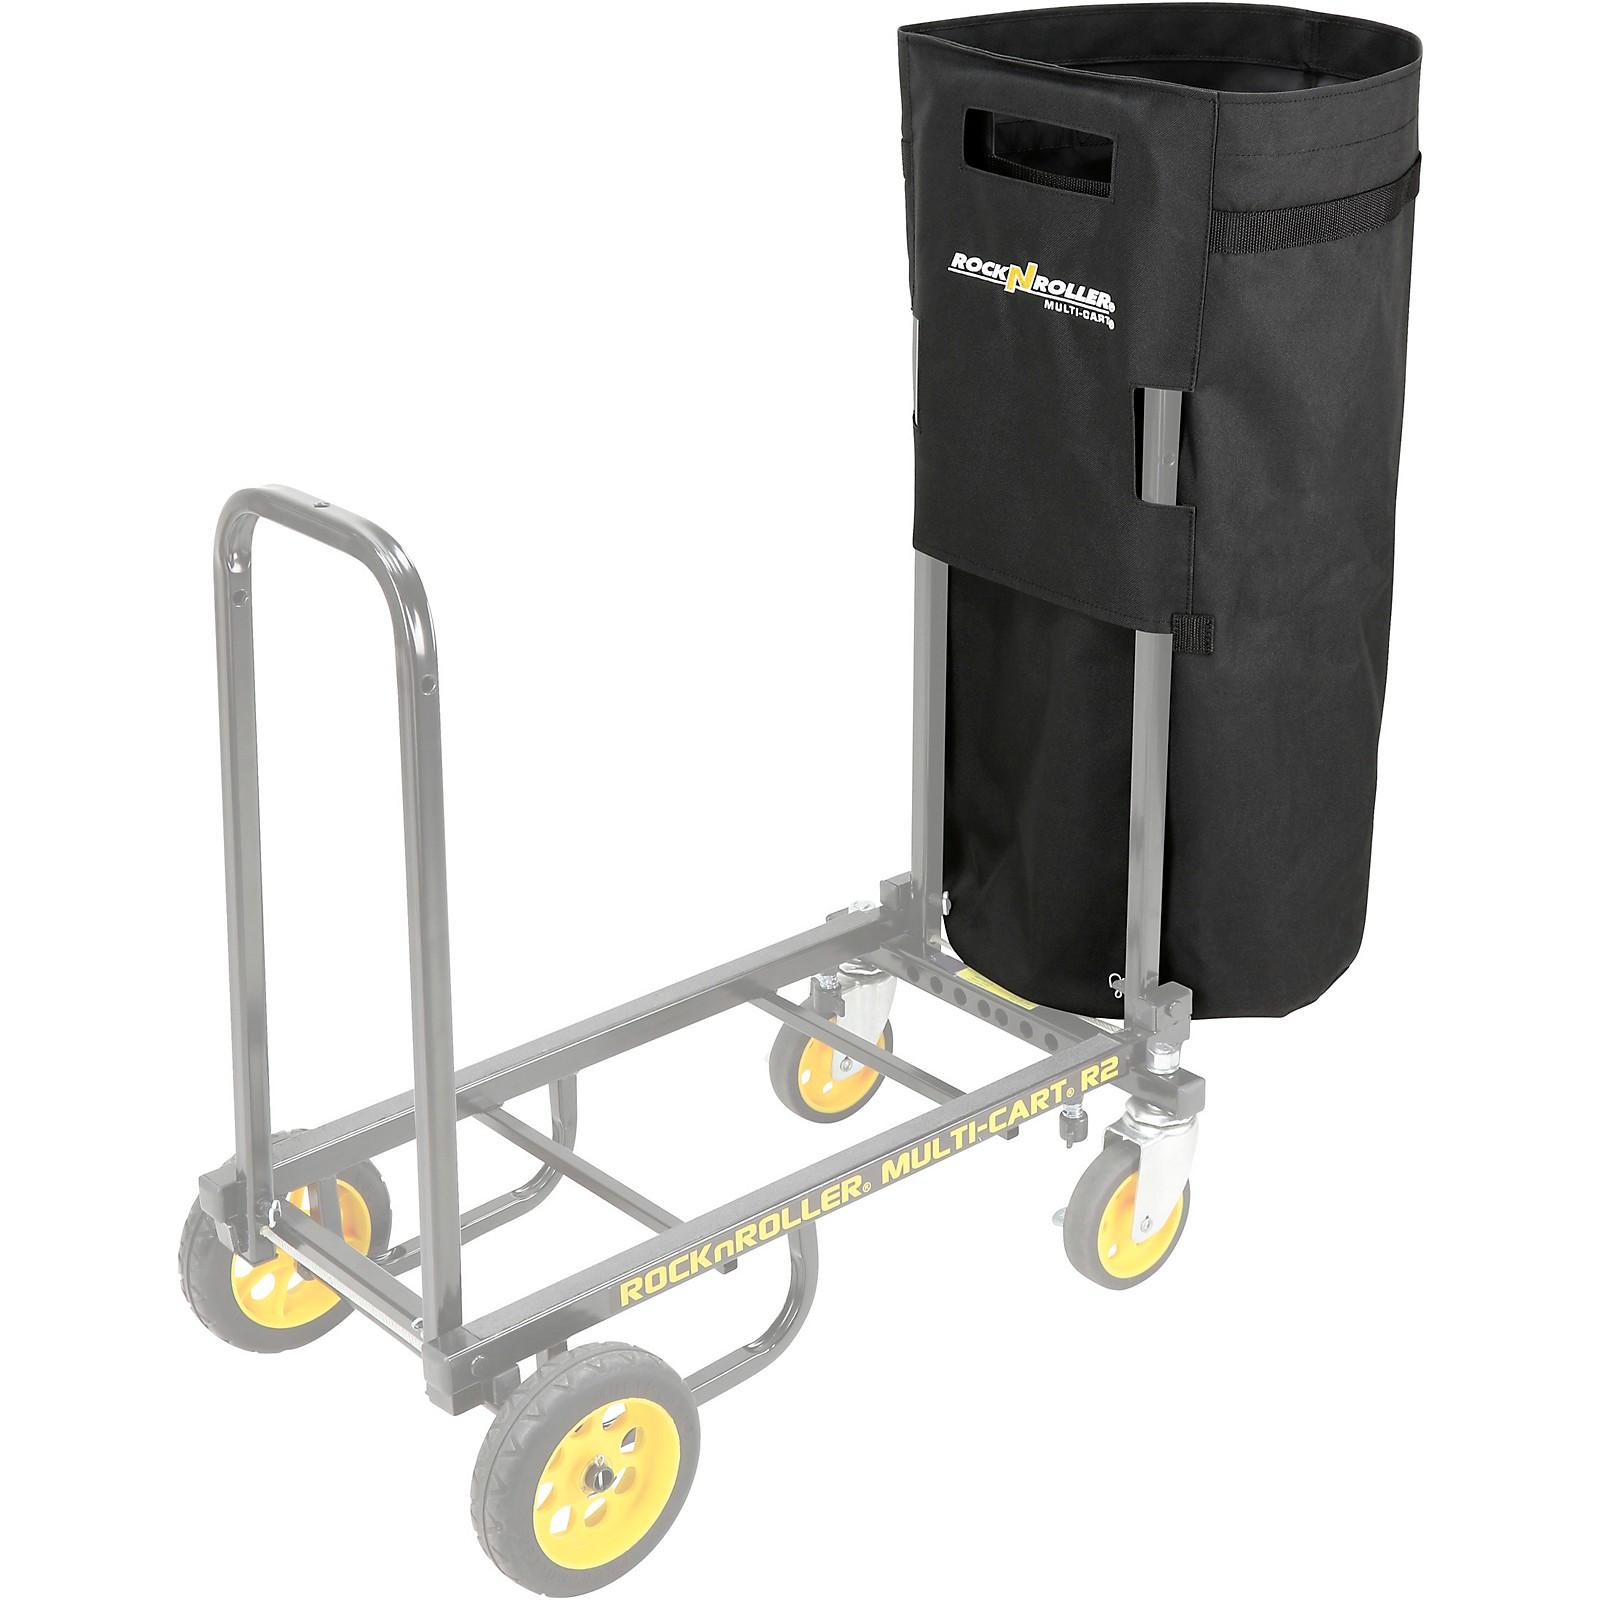 Rock N Roller RSA-HBR2 Handle Bag With Rigid Bottom for R2 Carts